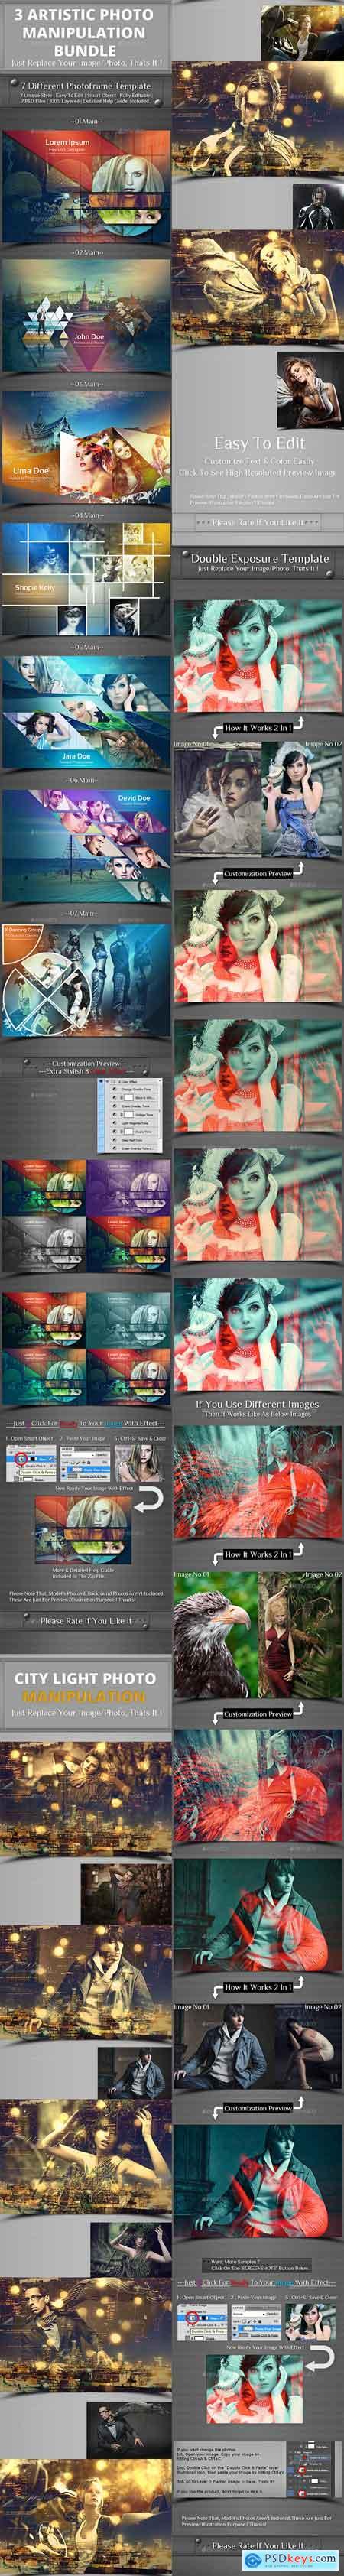 Graphicriver 3 Photo Template Bundle V2